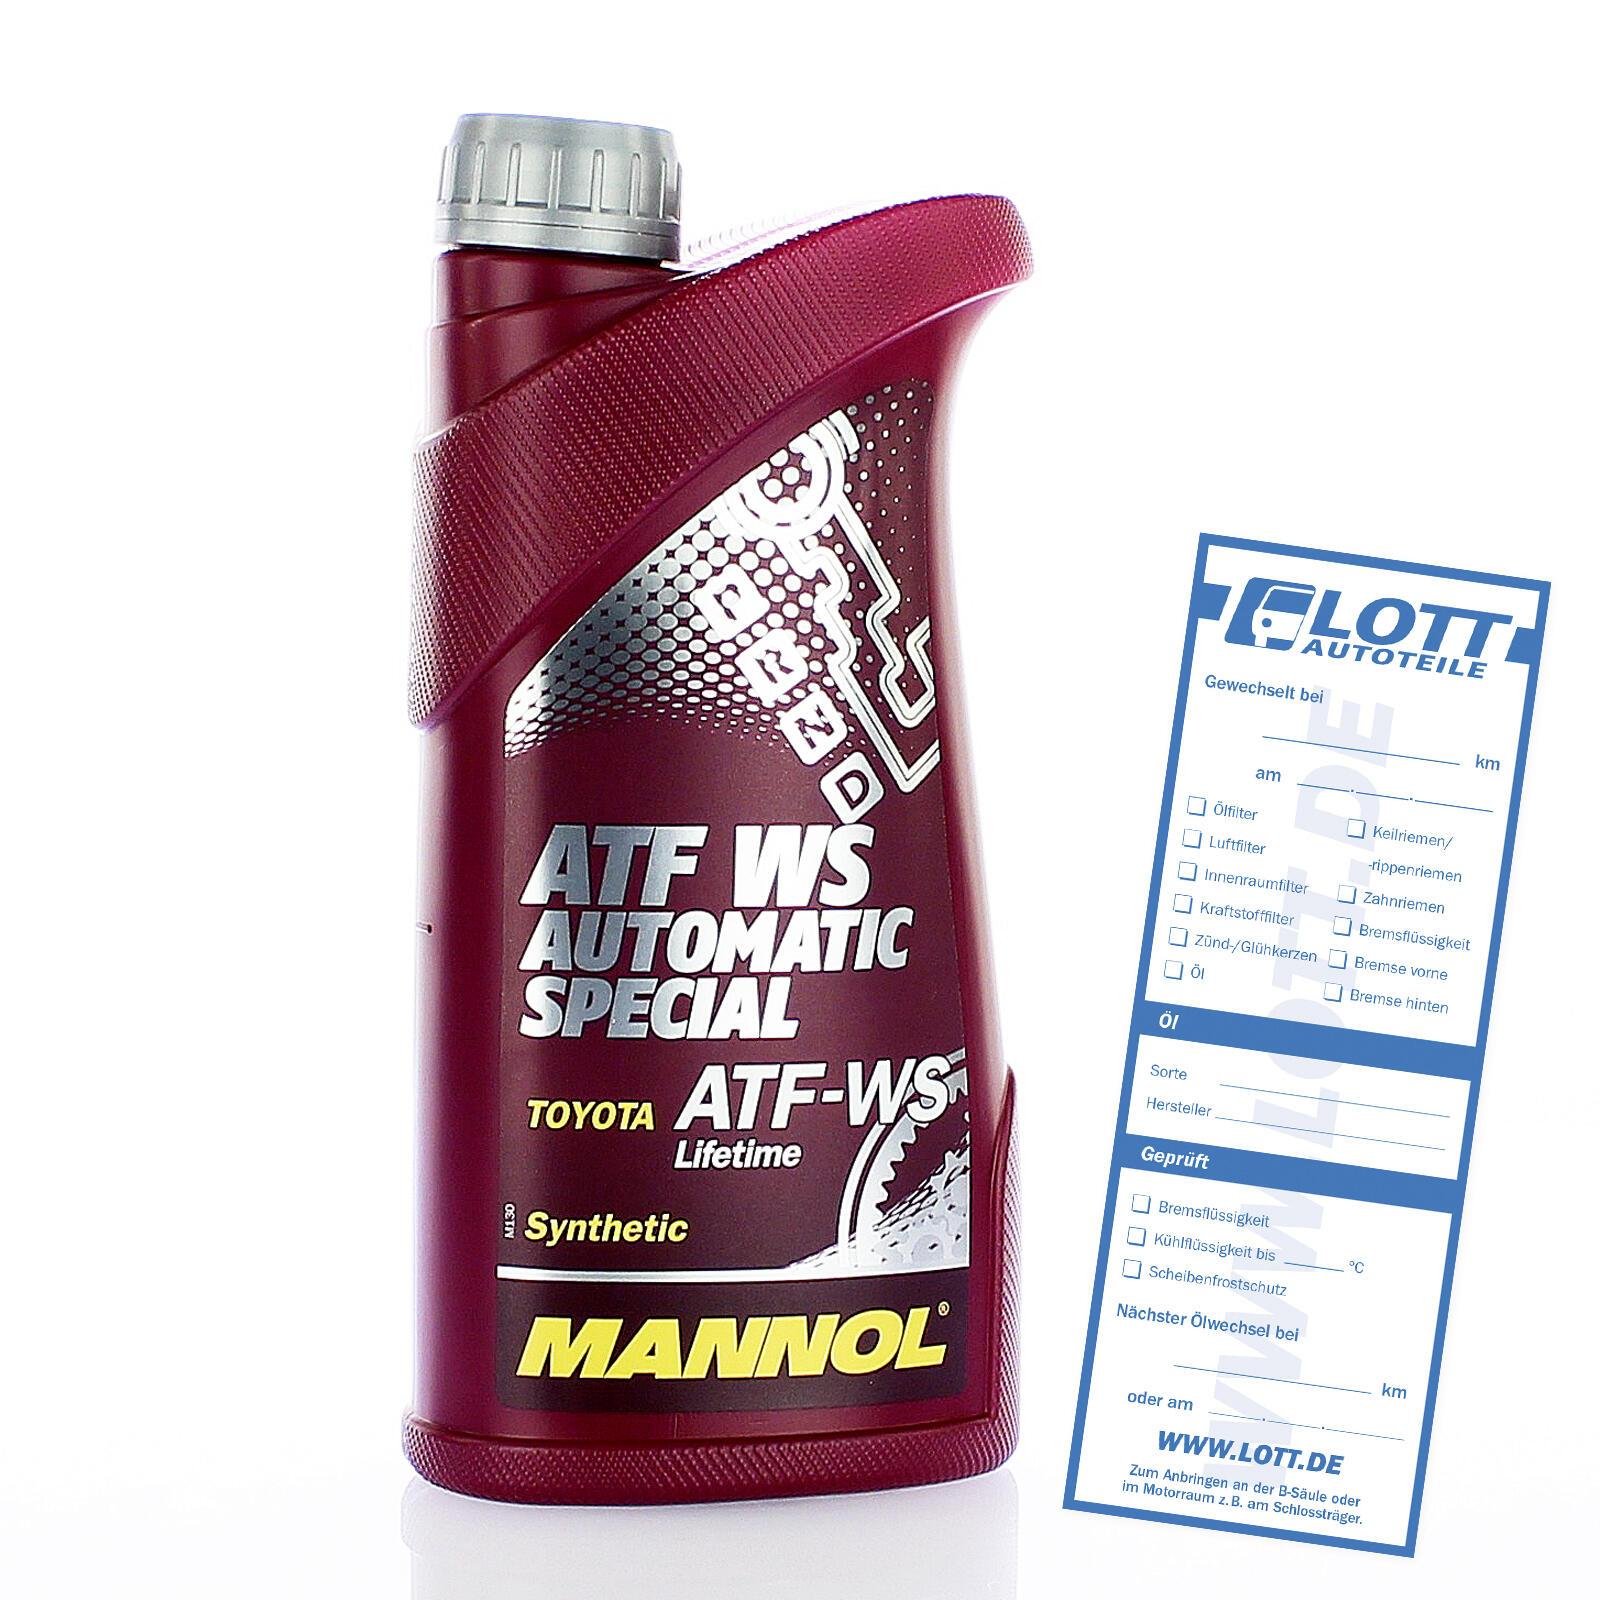 MANNOL ATF WS Automatic Spezial Getriebeöl 1 Liter